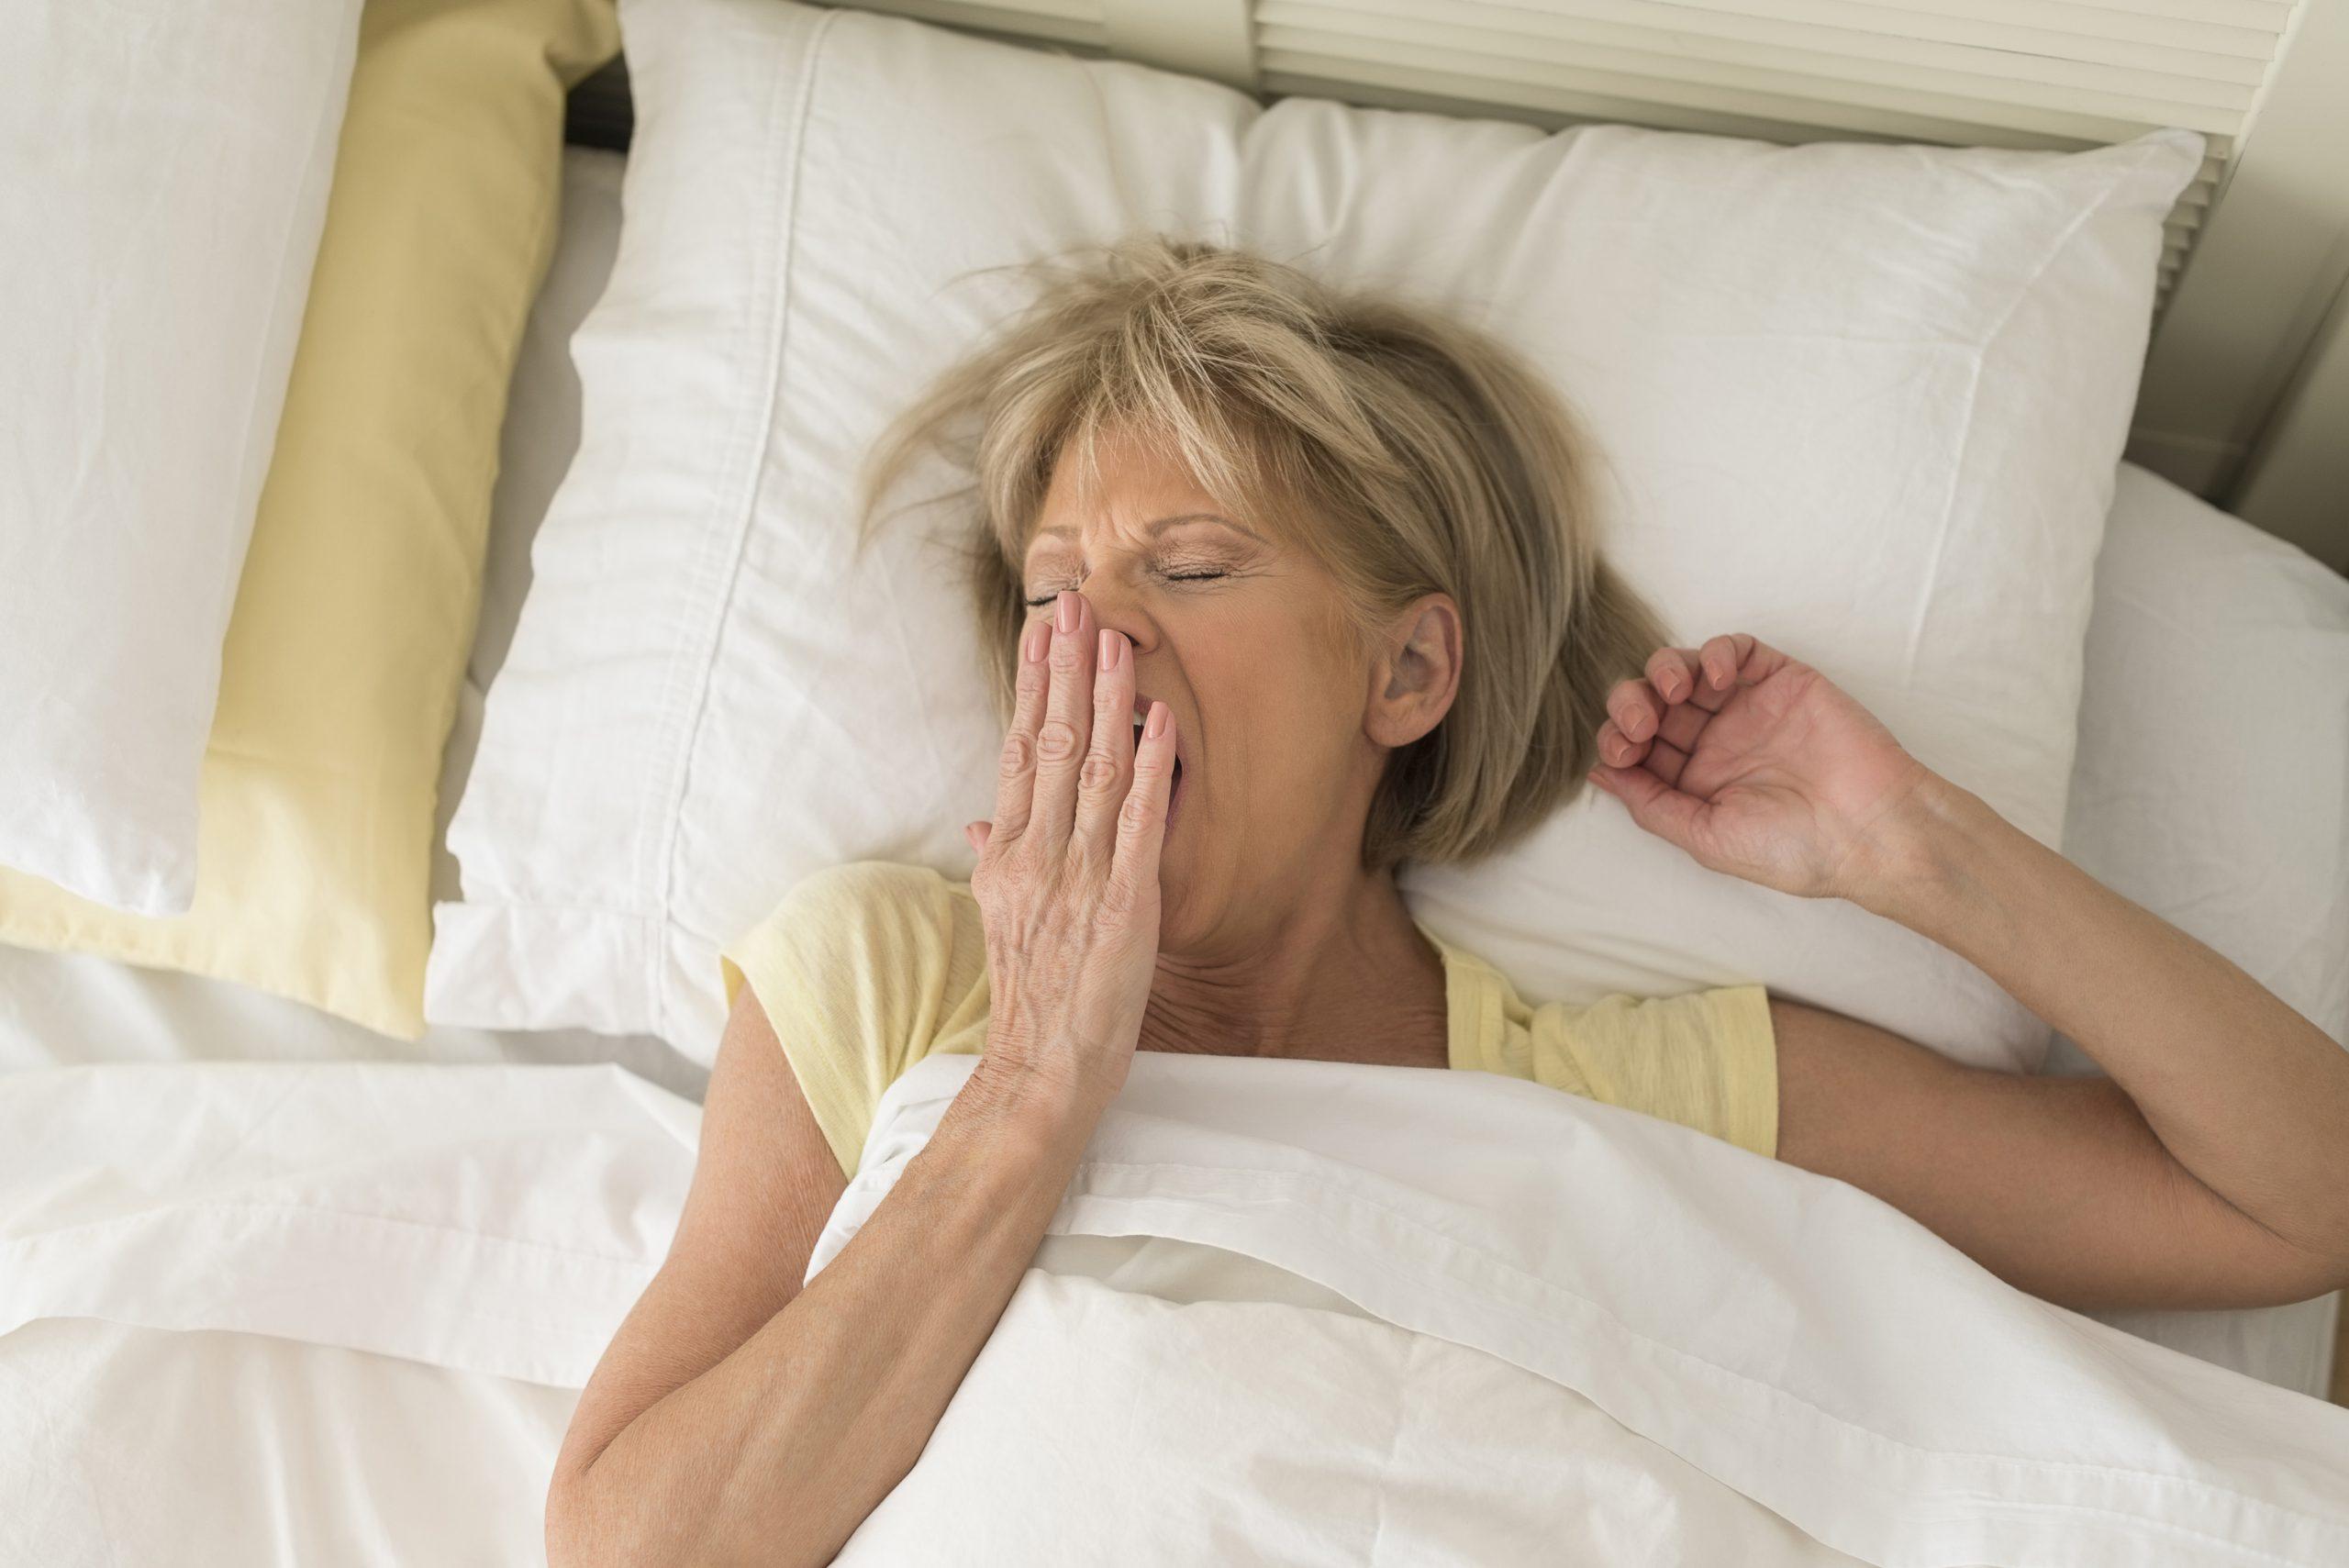 Insomnia symptoms increase heart disease stroke risk